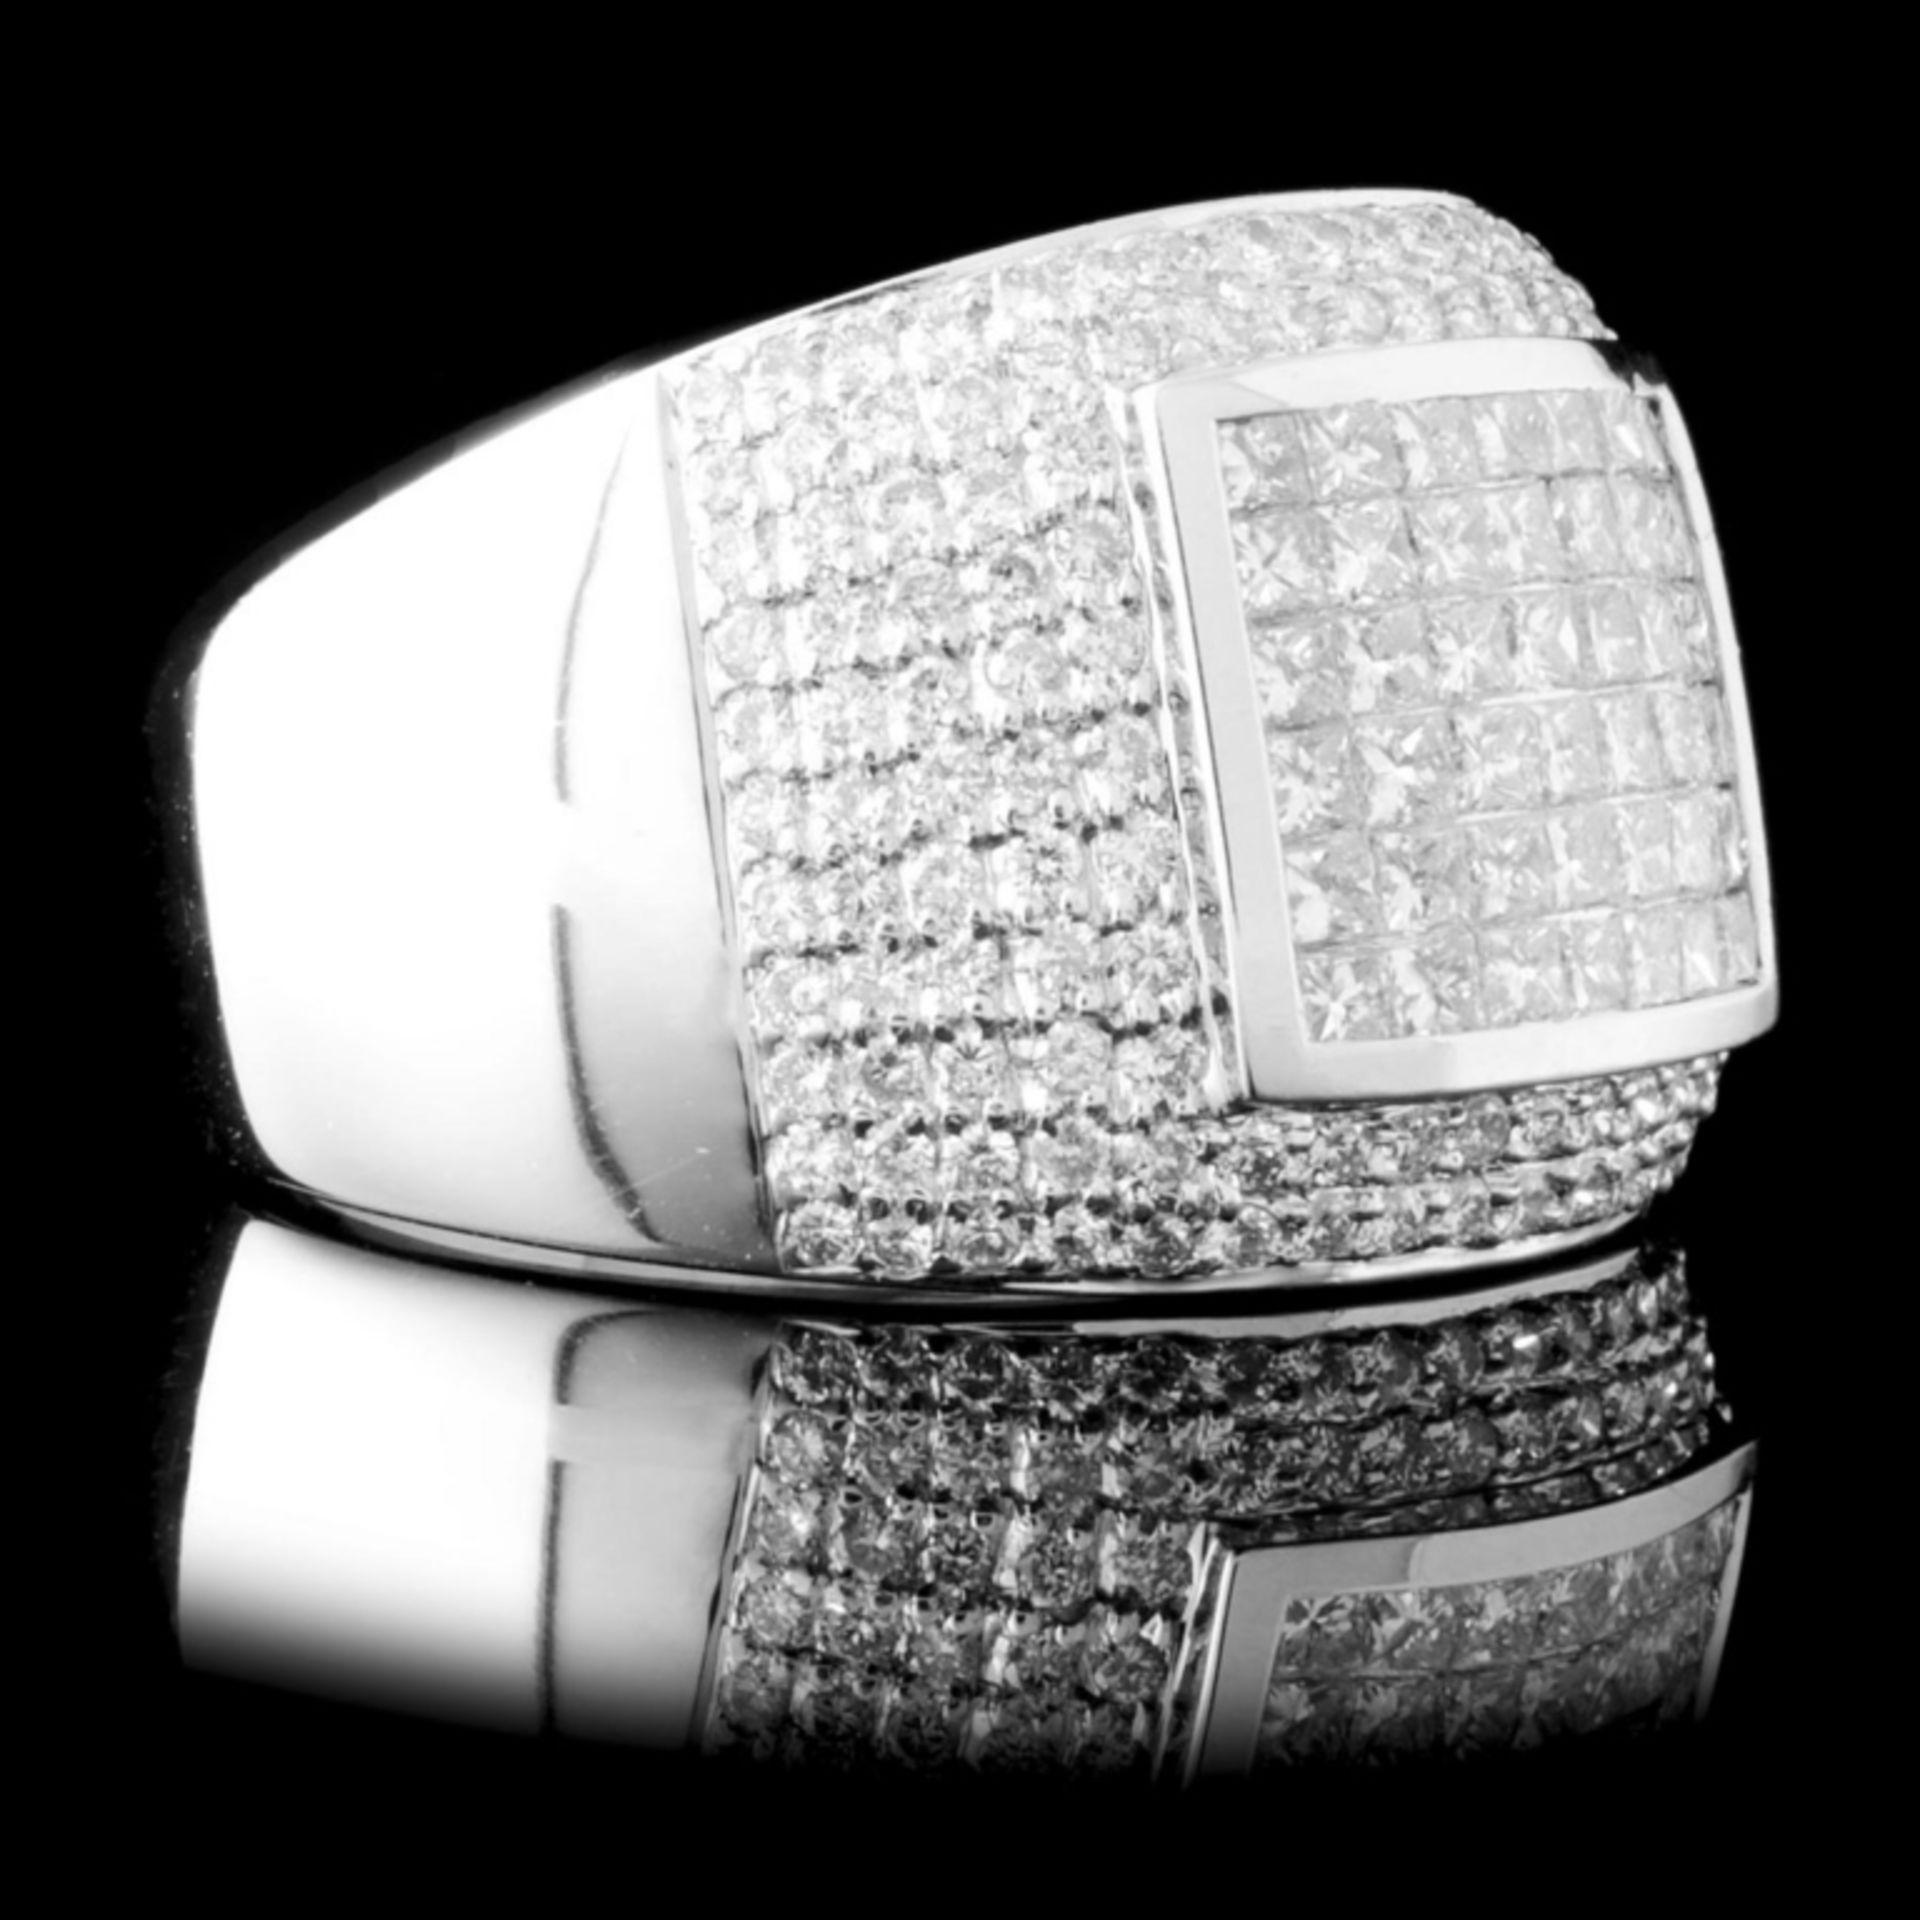 18K Gold 1.55ctw Diamond Ring - Image 3 of 4